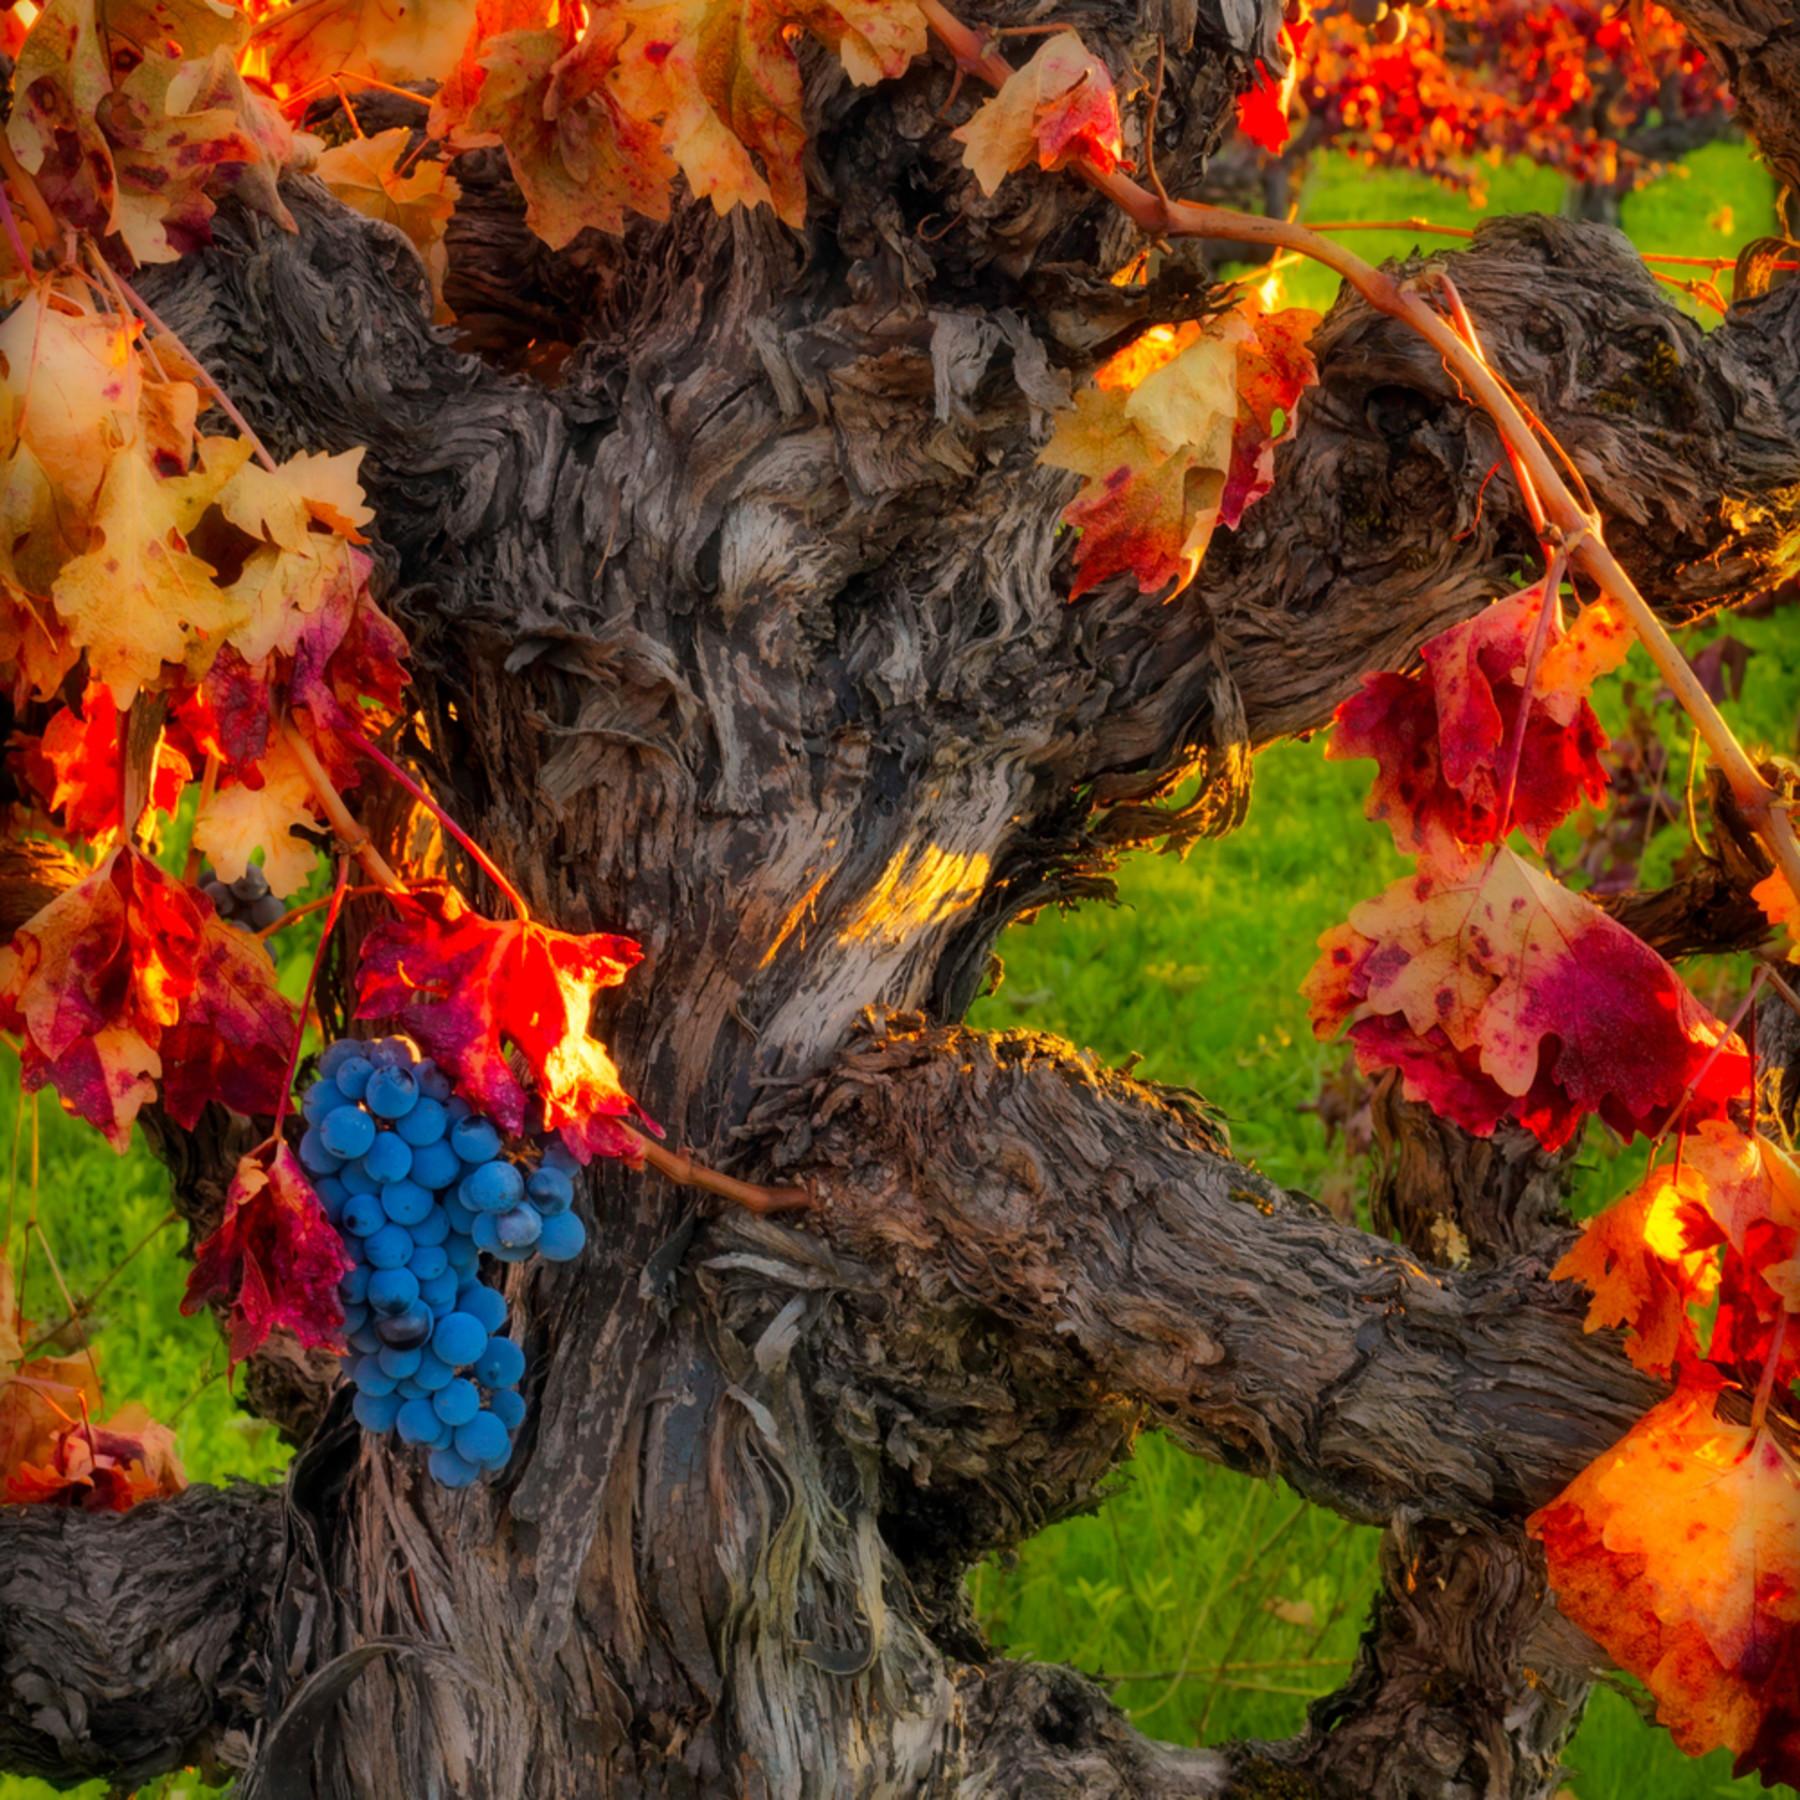 Autumn harvest hprggl